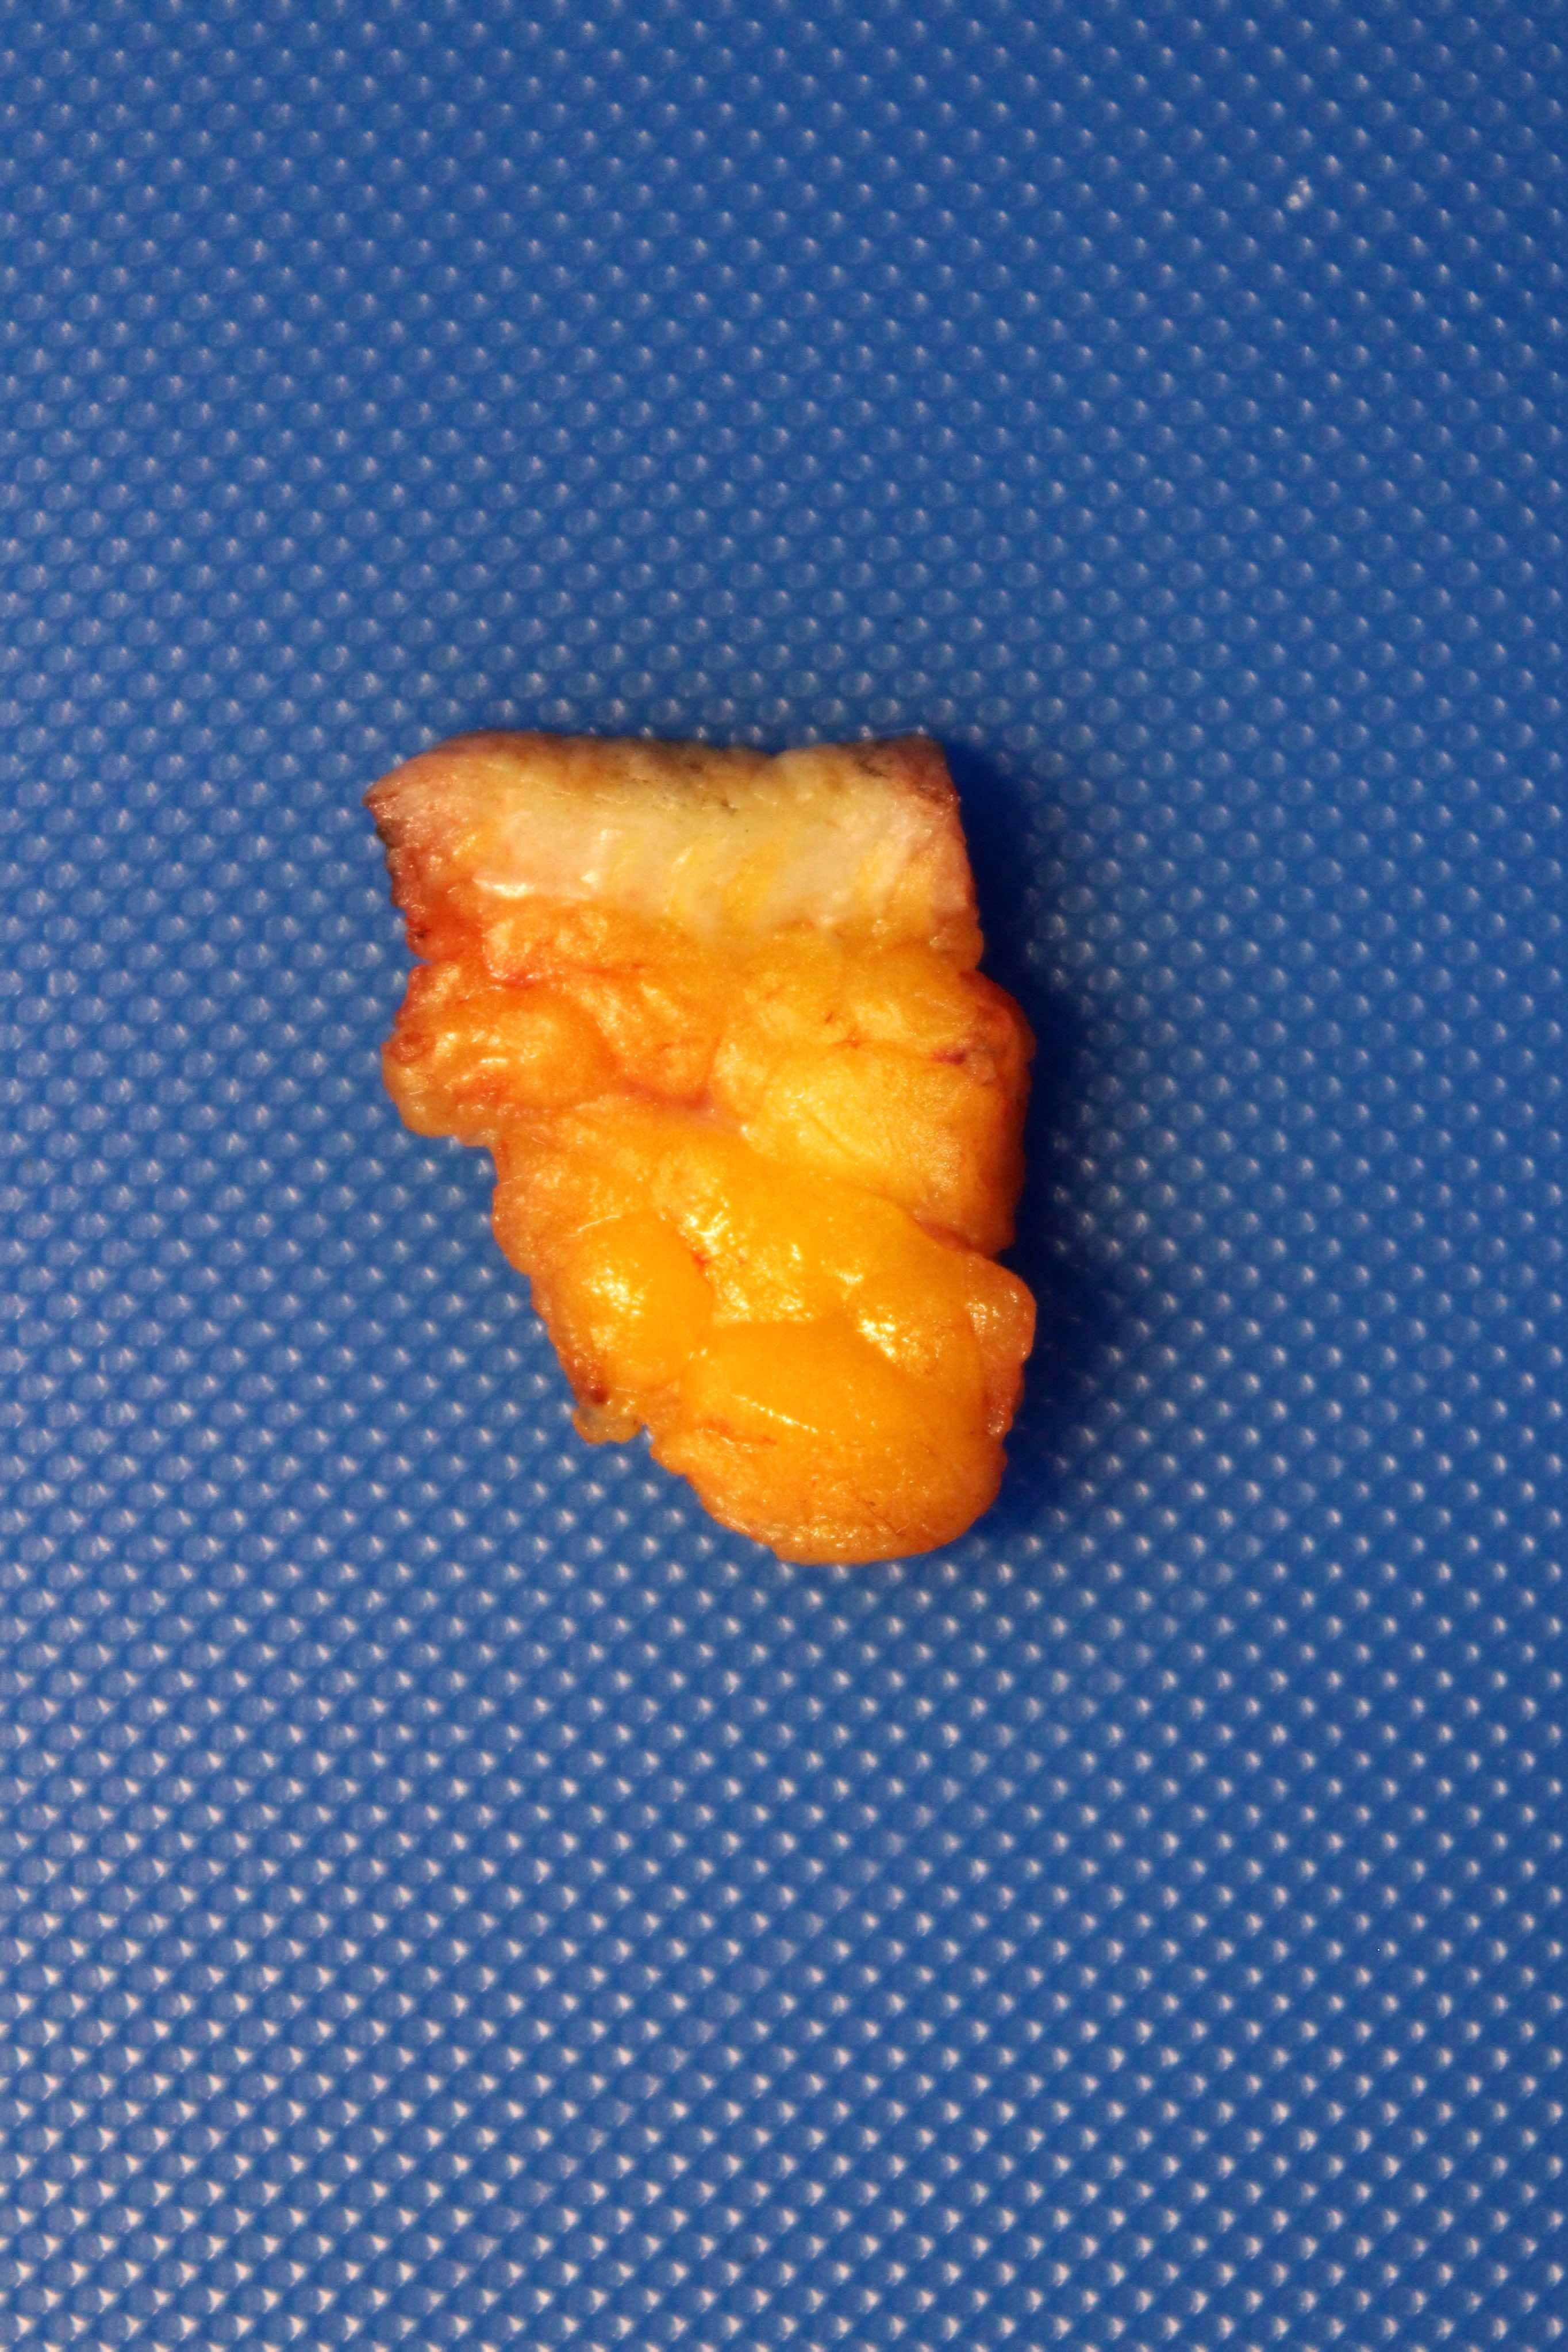 Subcutaneous fibroadipose tissue